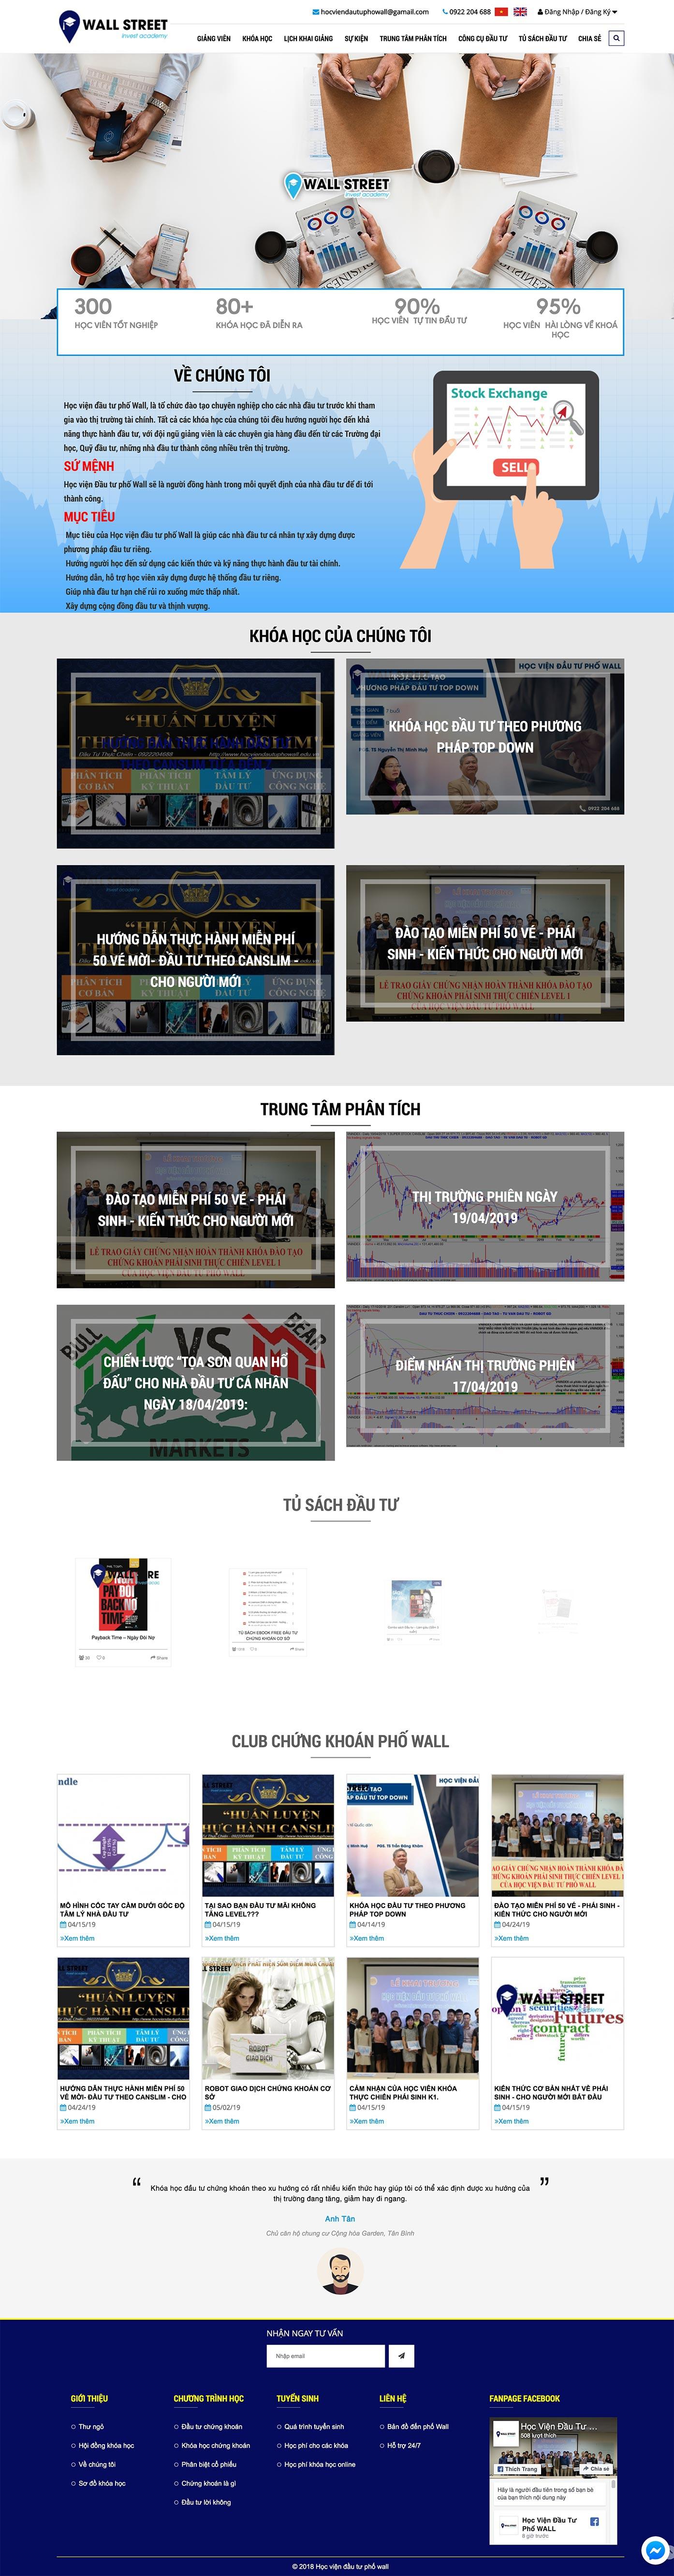 Mẫu website đào tạo 13487